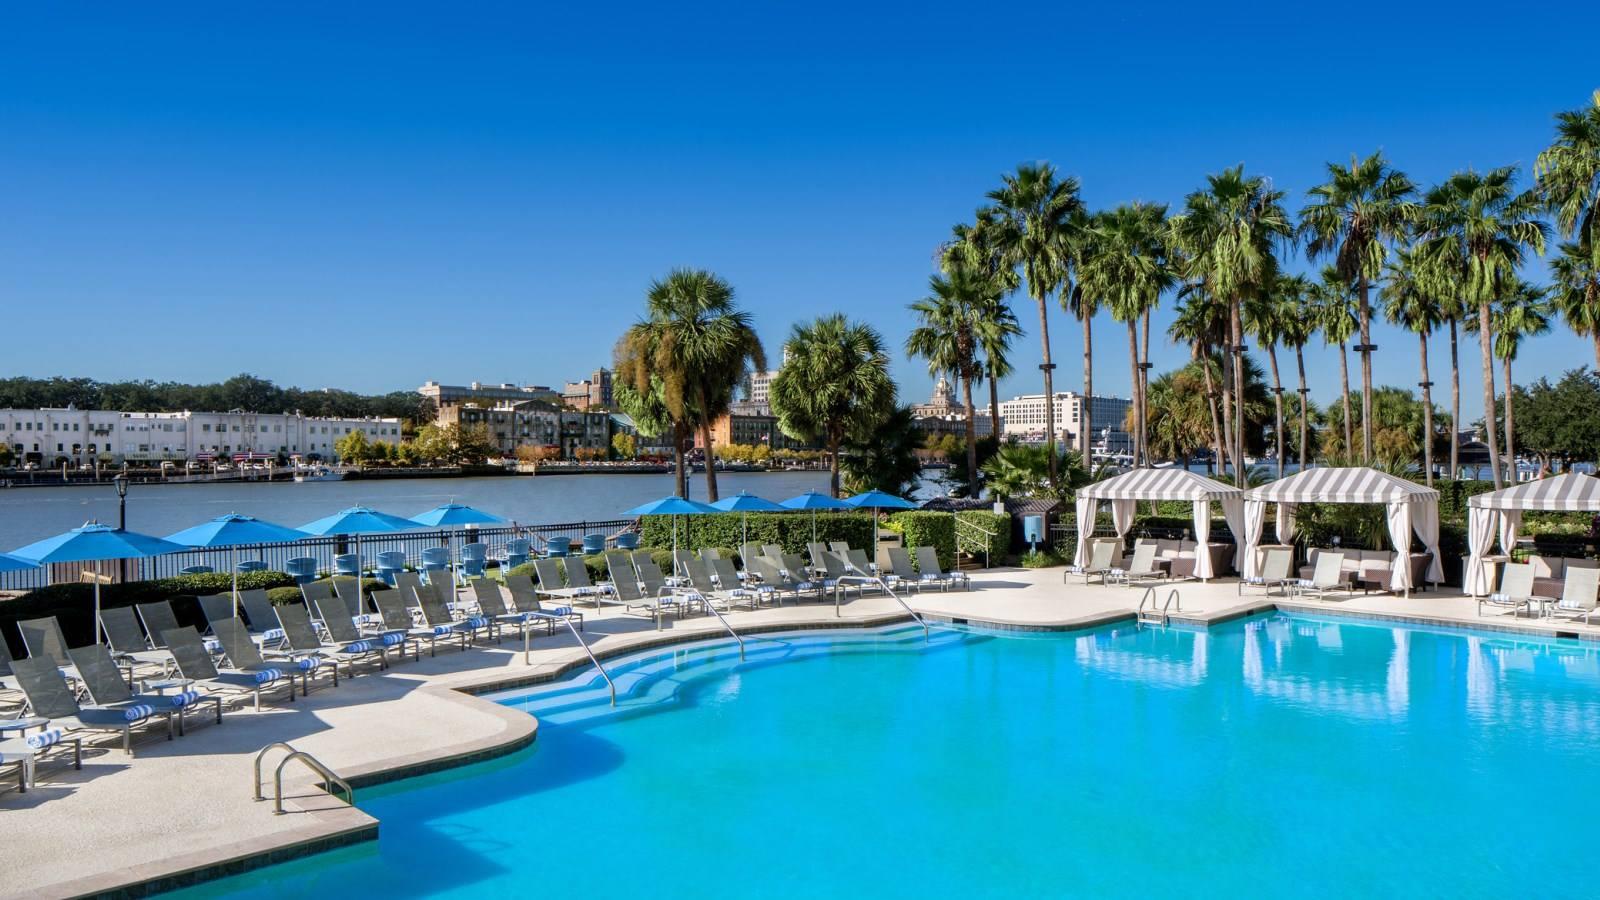 Westin Savannah Harbor Golf Resort and Spa swimming pool